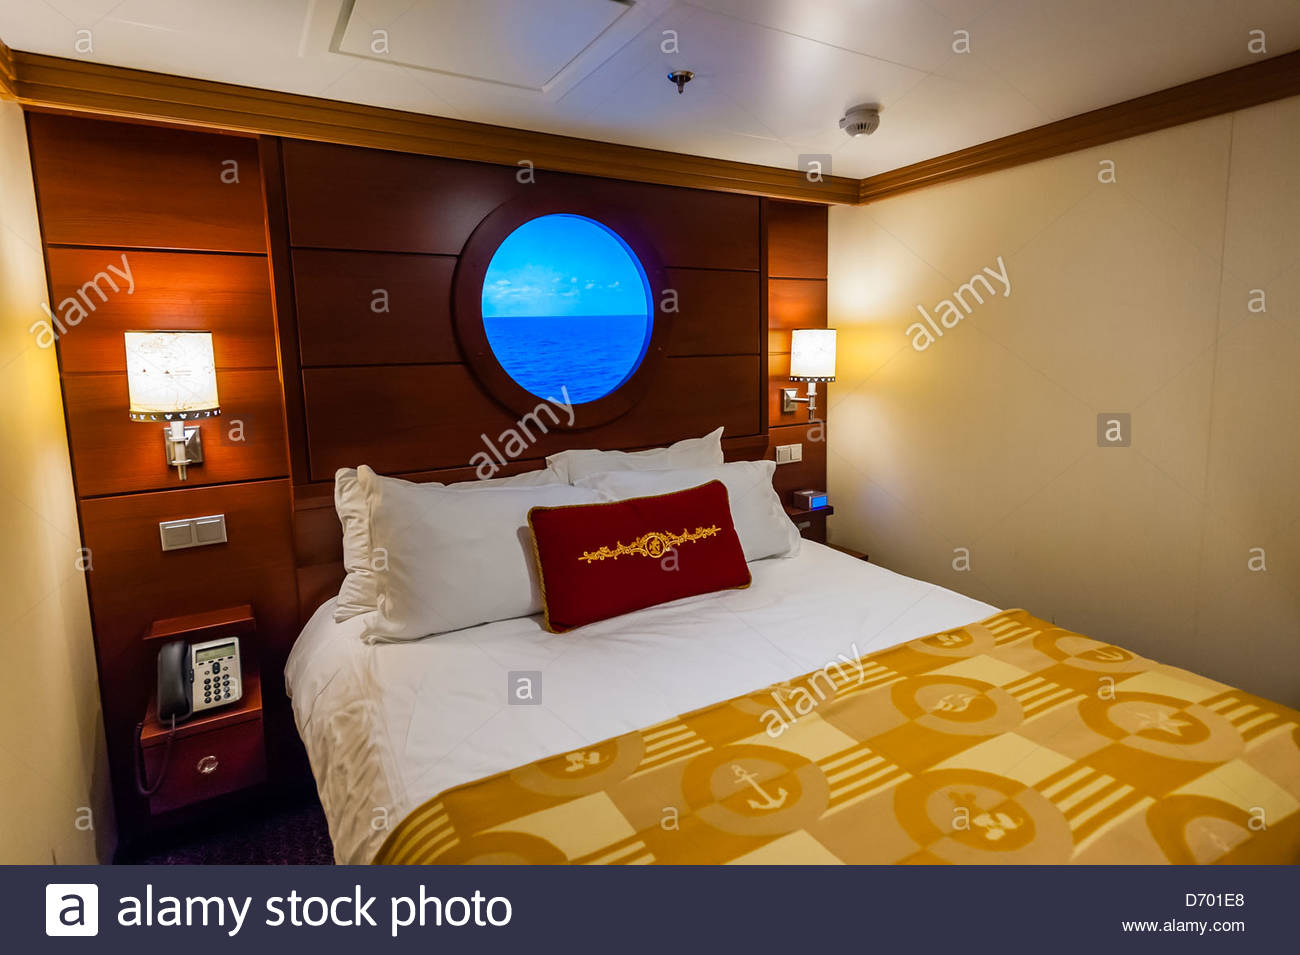 A Virtual Porthole In A State Room Disney Dream Cruise Ship - Stateroom on a cruise ship